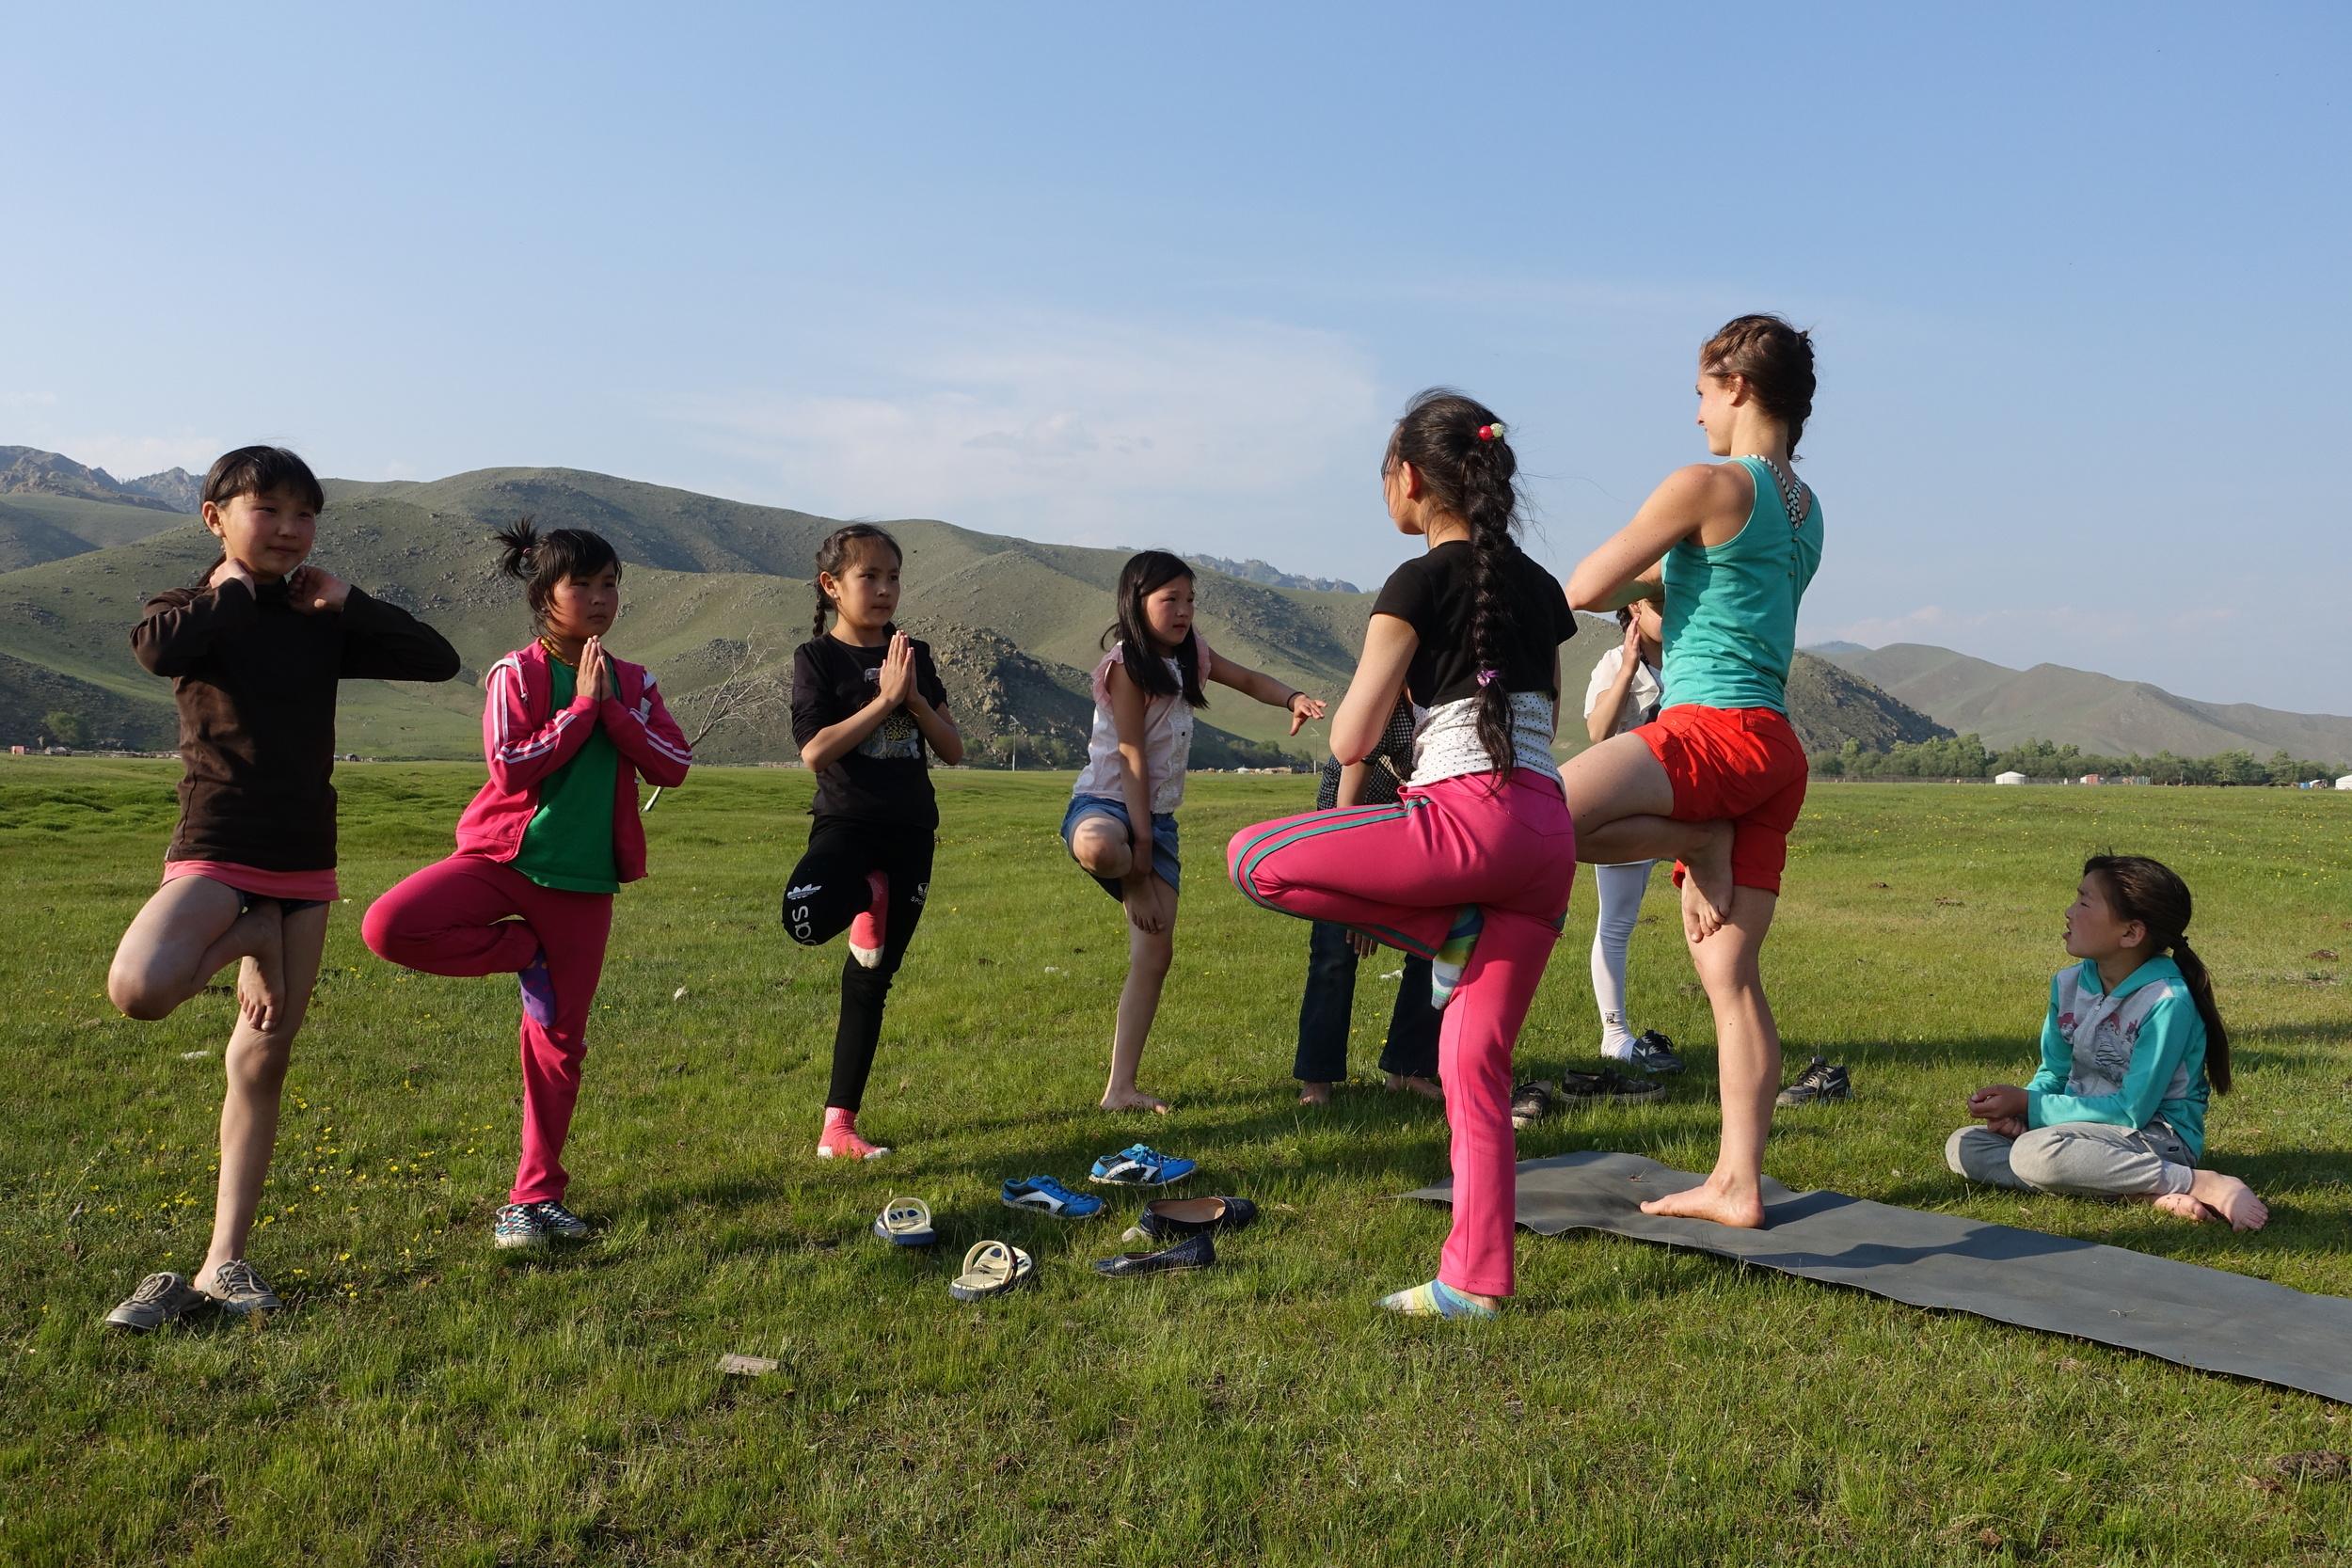 8 aspirant yogis